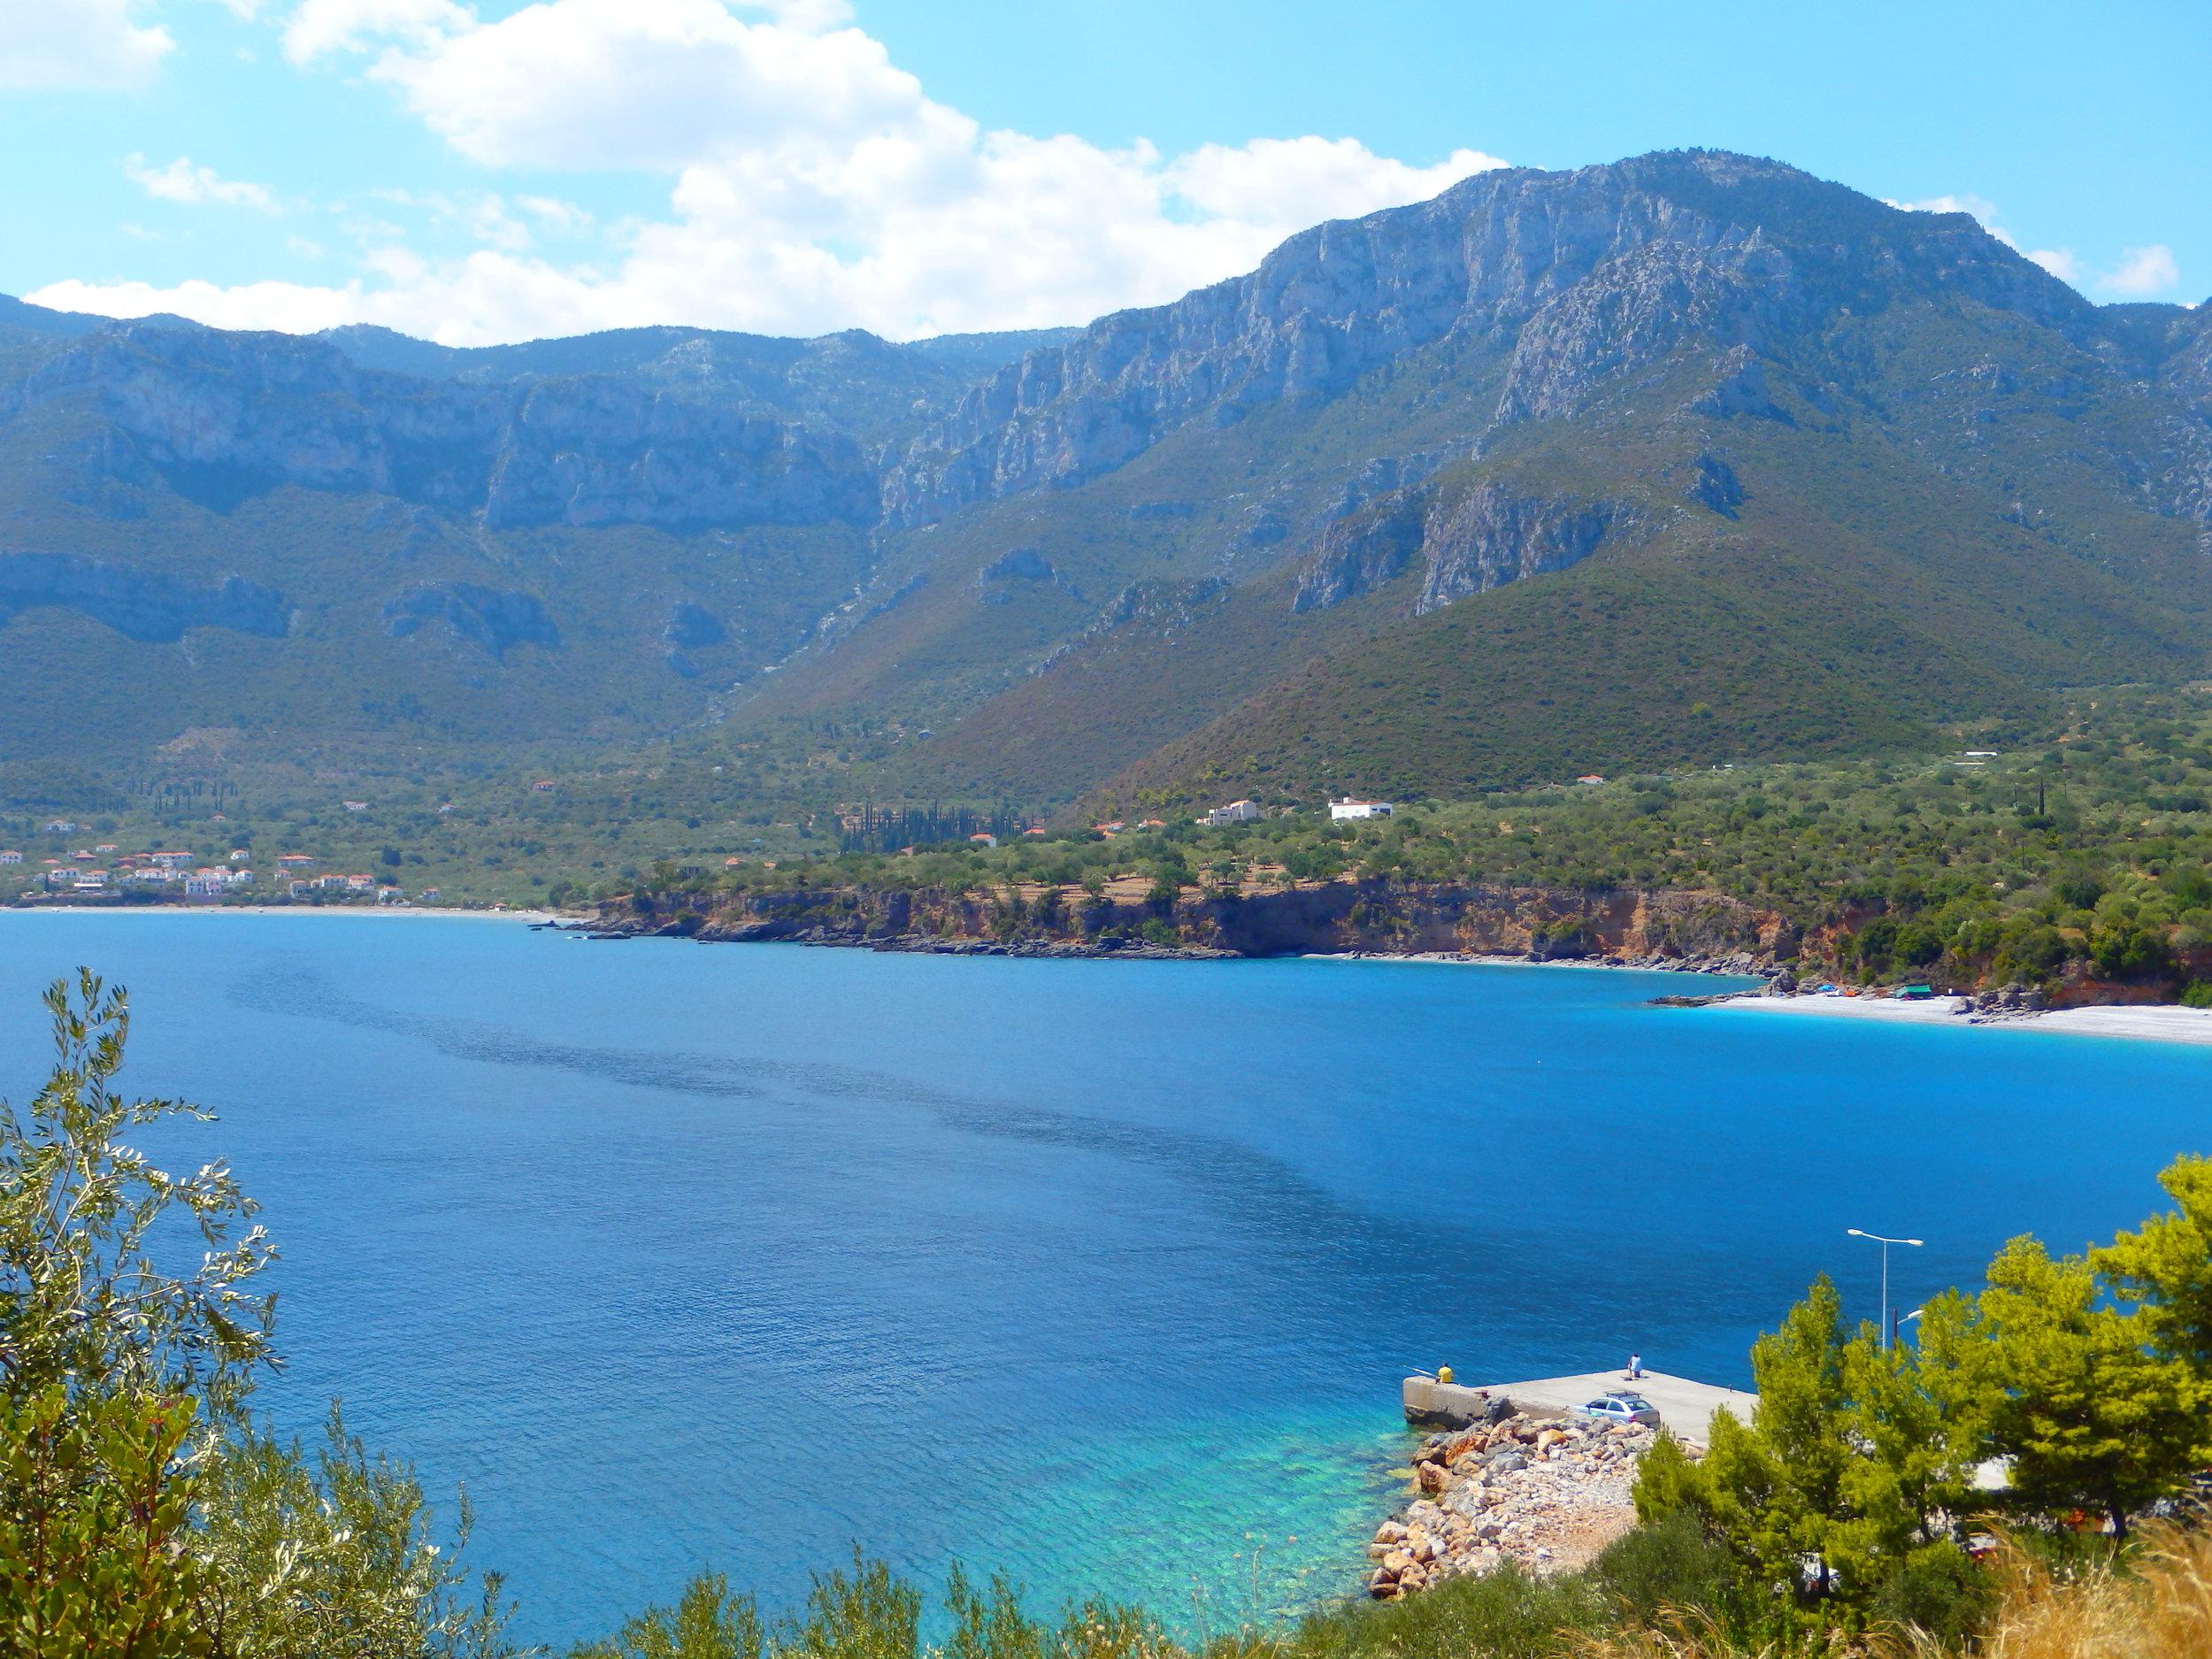 The home of Kouzini! Lakonia Greece!